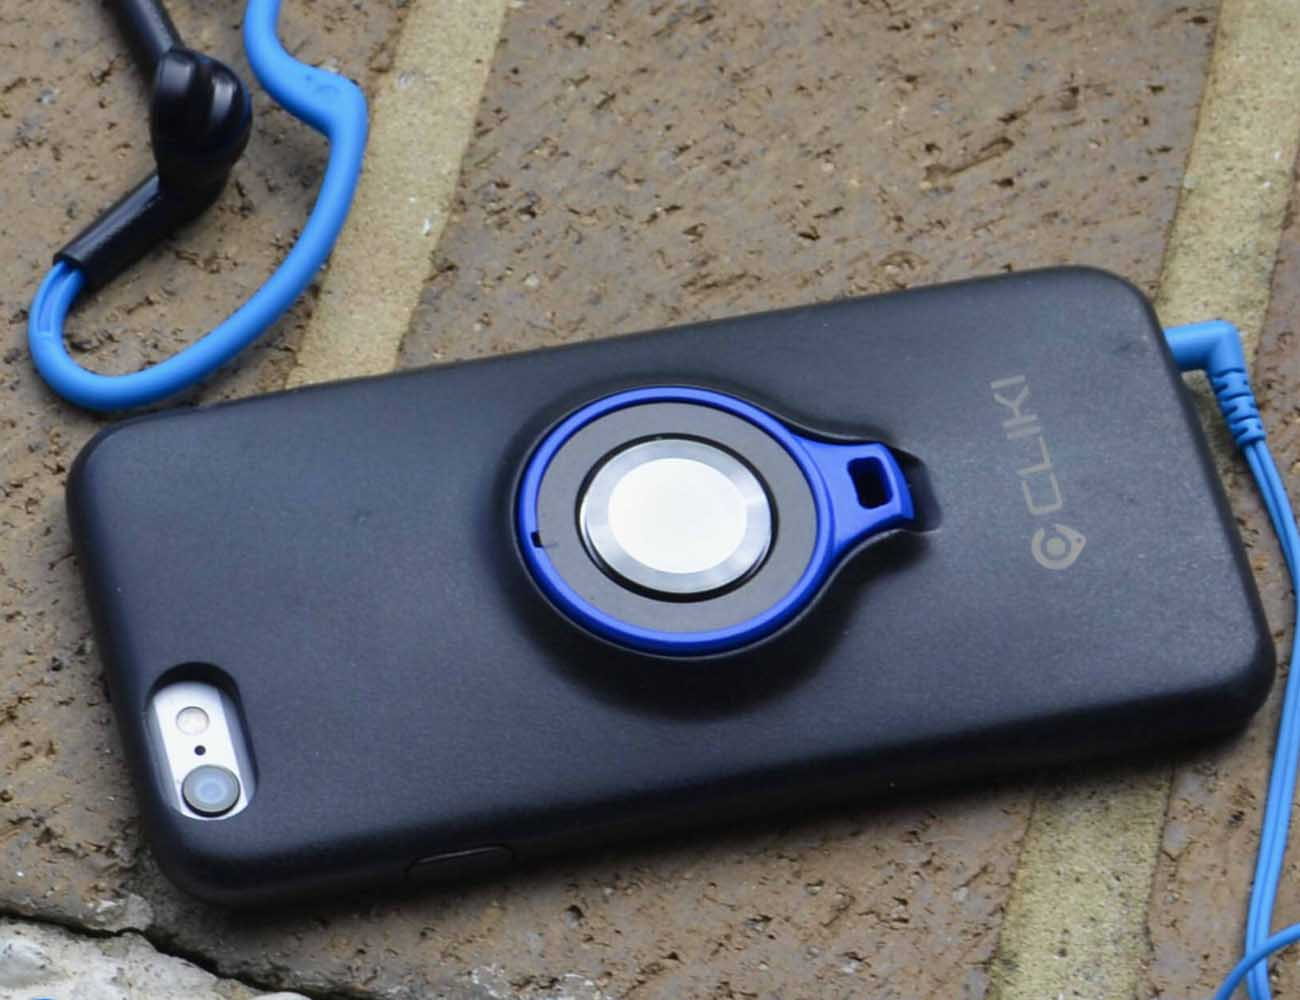 CLIKI – Removable Smart Control Button Case